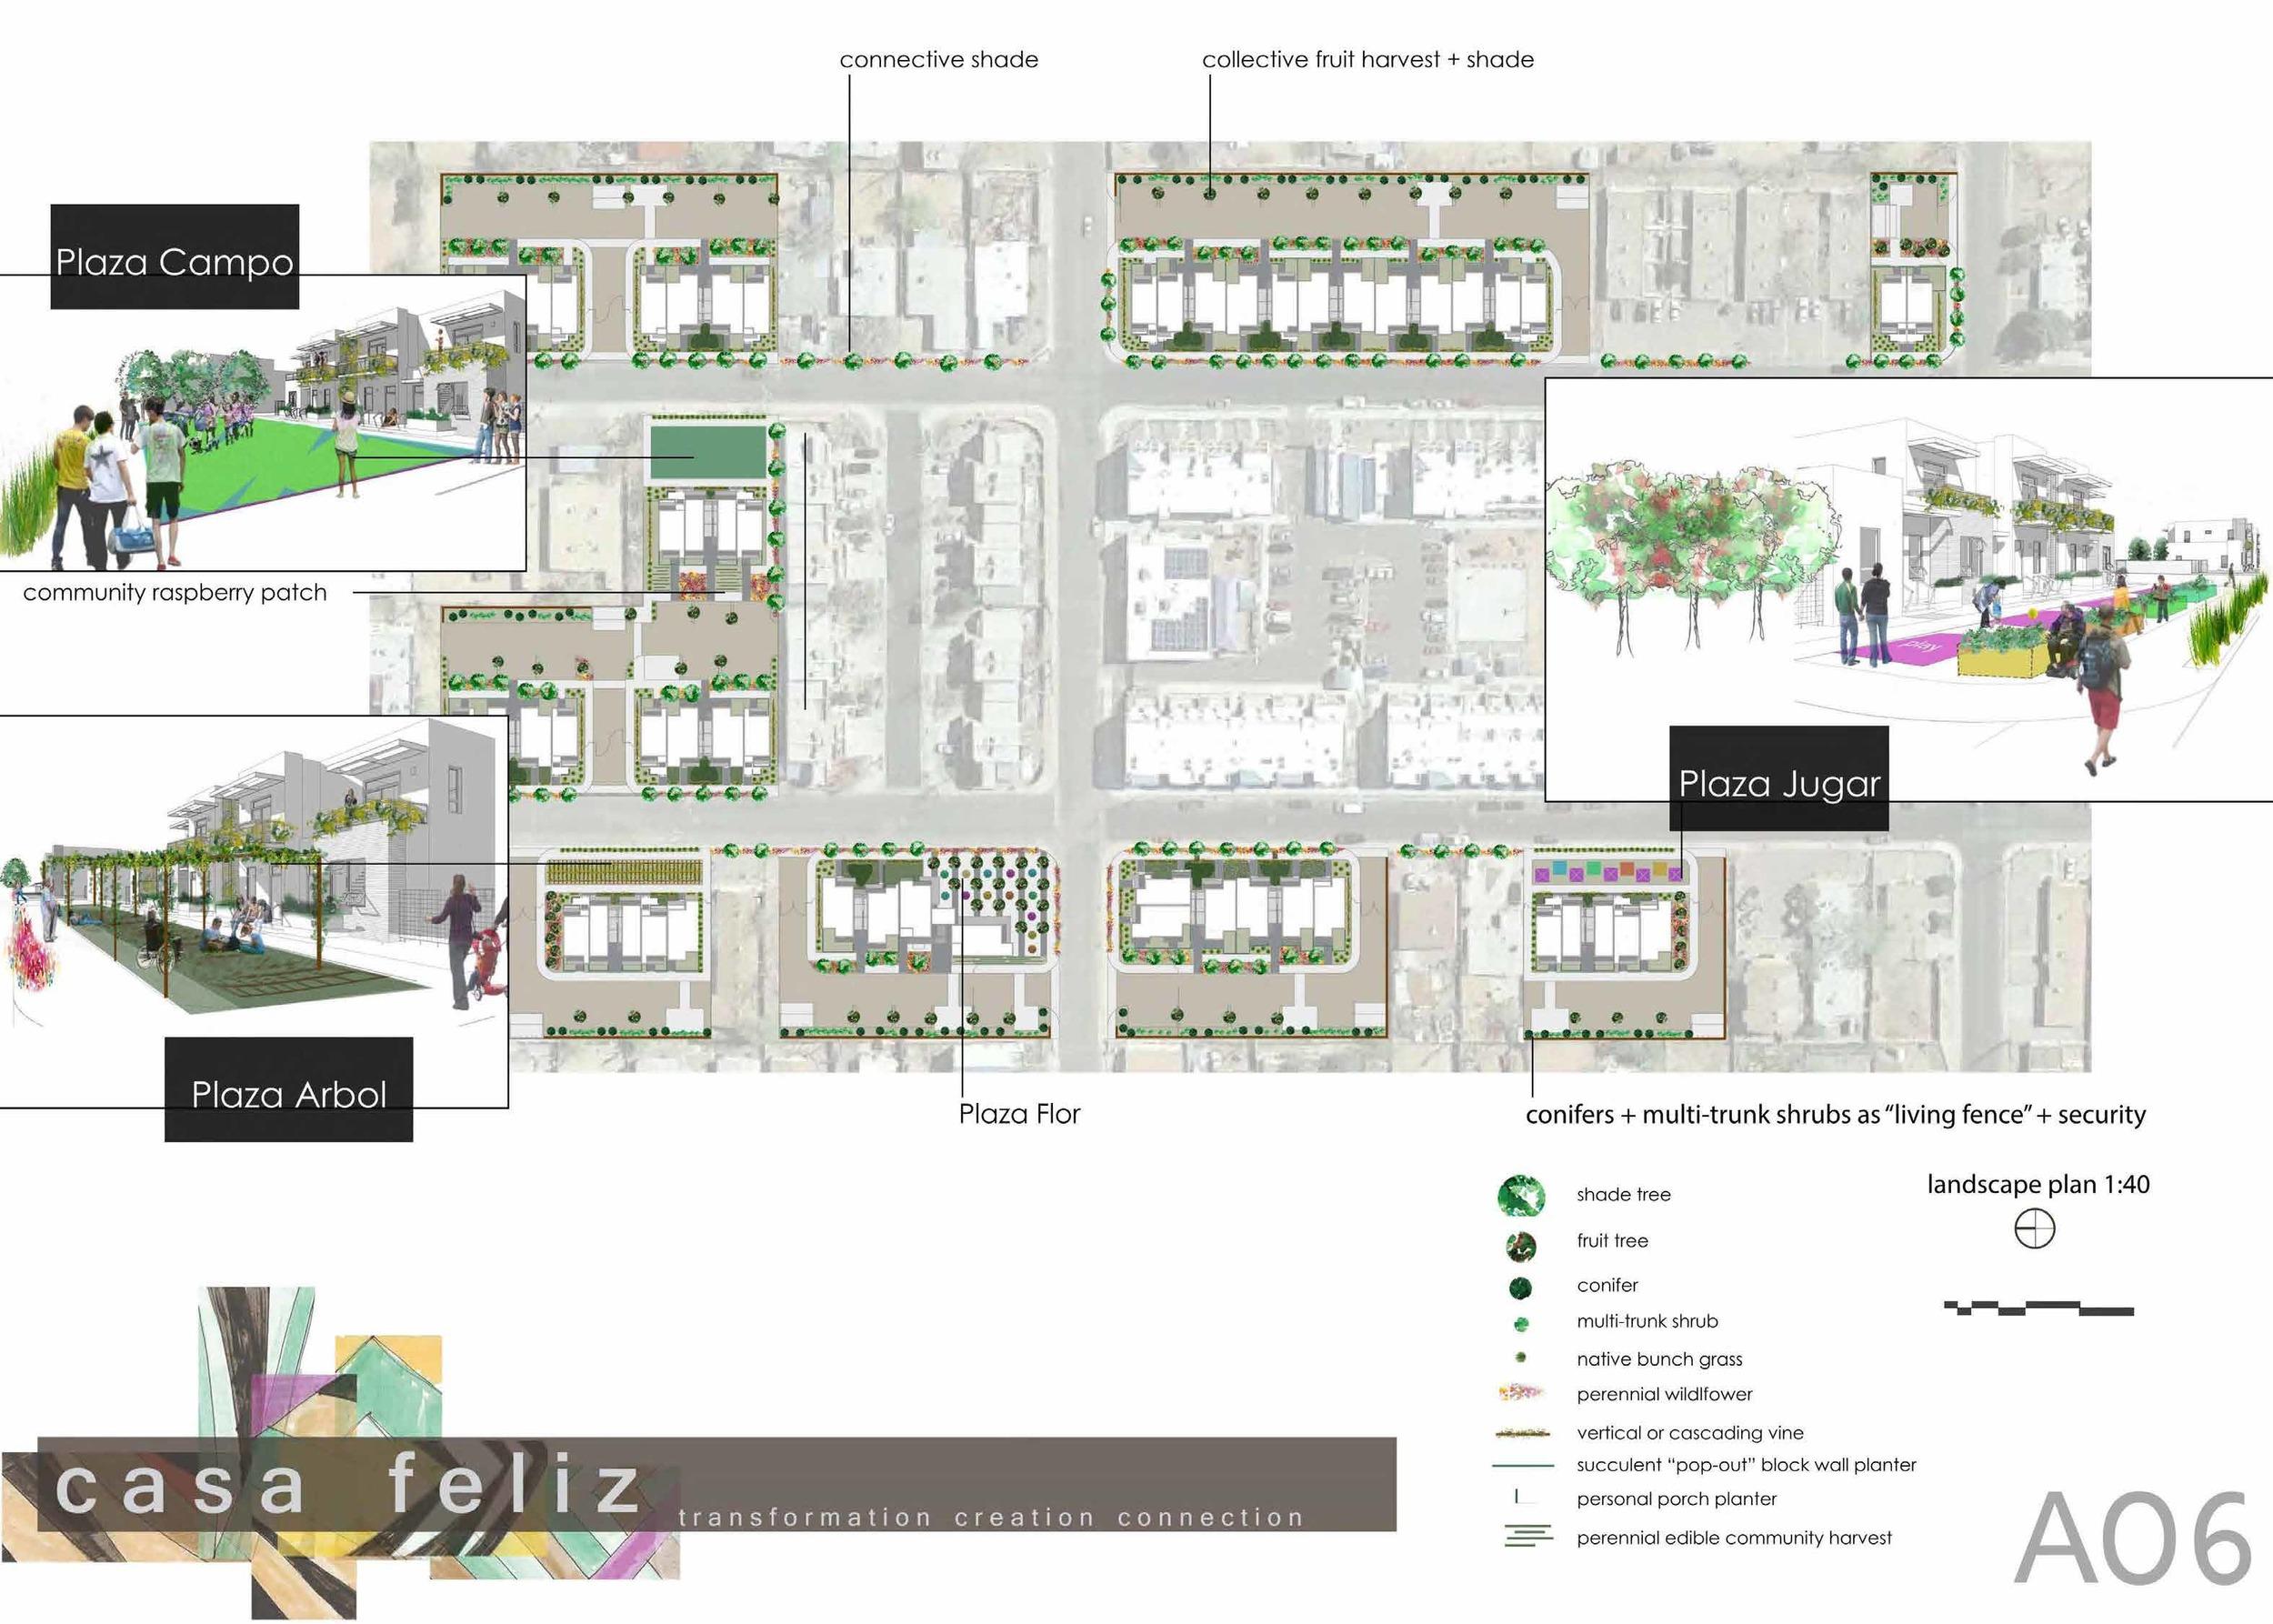 GAHP Casa Feliz MFA Design Competition Submittal 2015-02-02 6.jpg